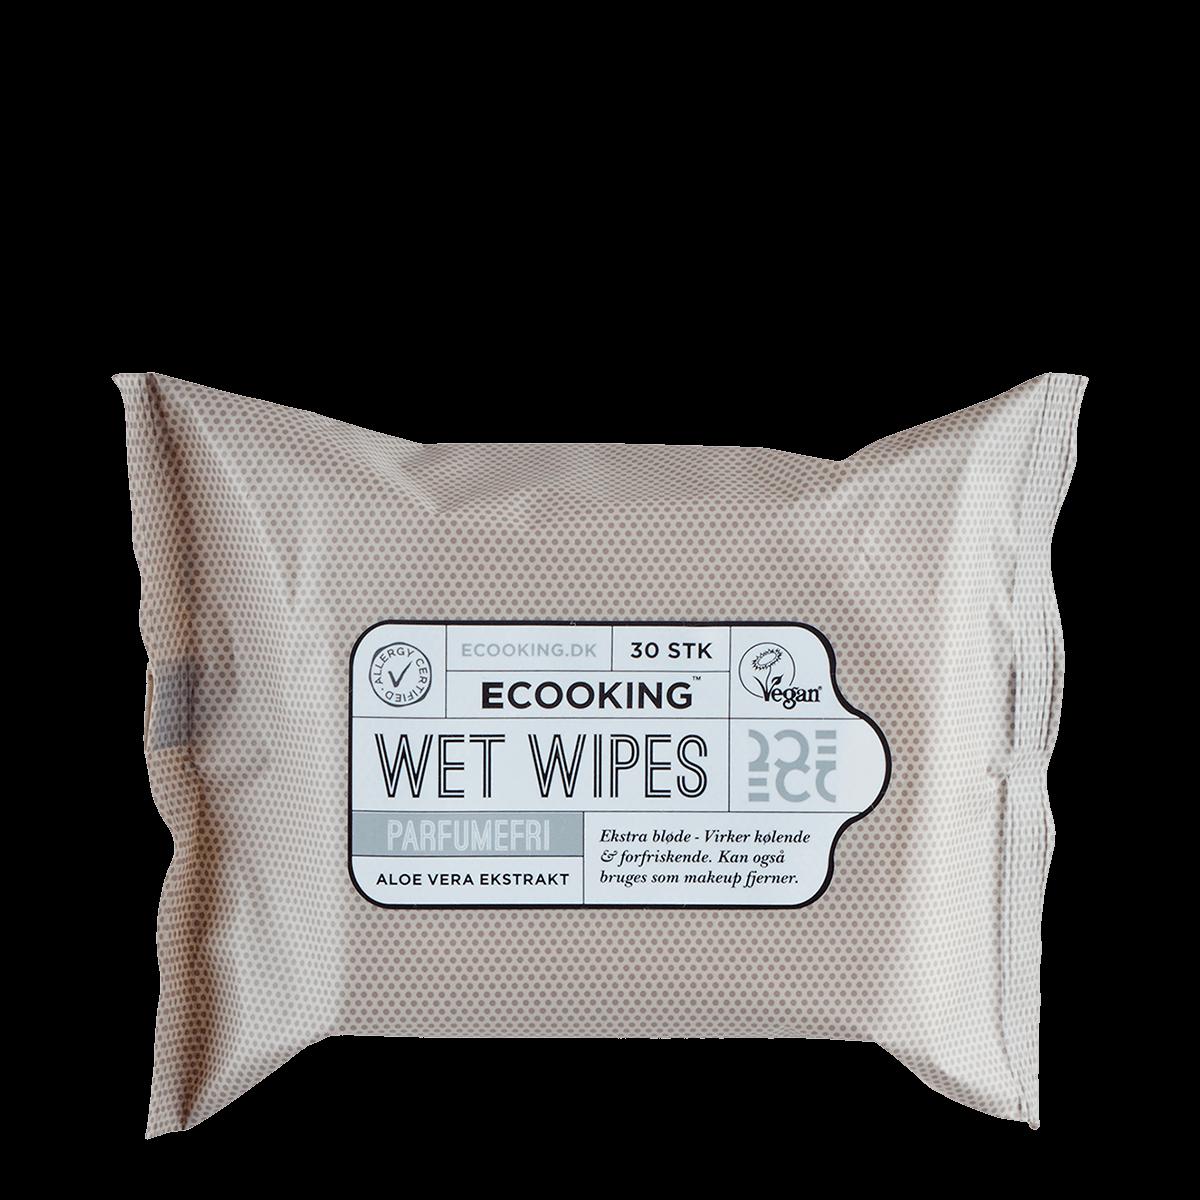 Wet Wipes Parfumefri 30 stk.